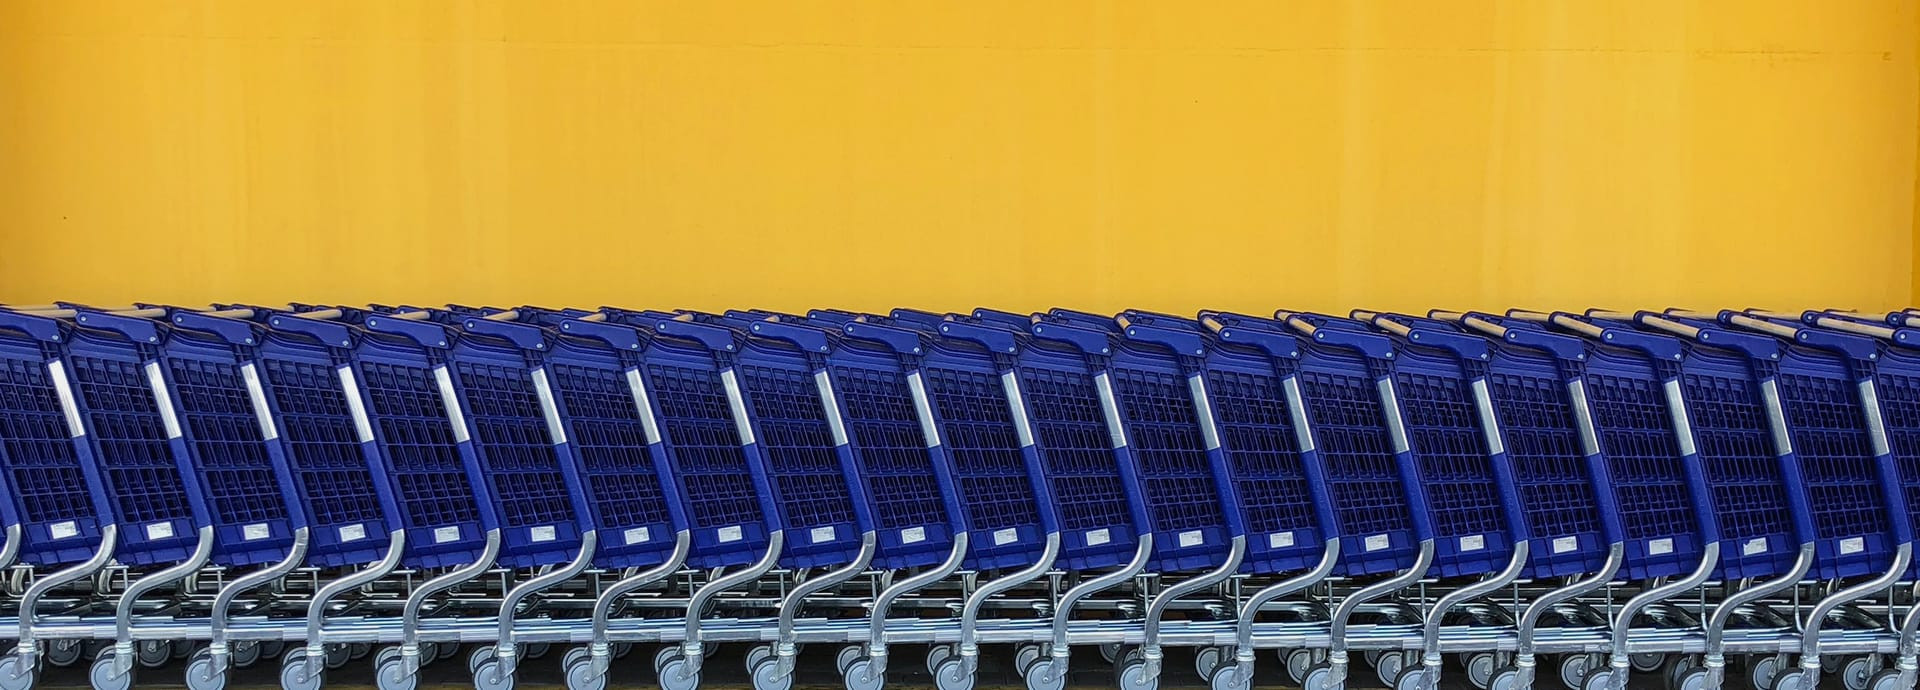 Walmart - Galeries Rive Nord